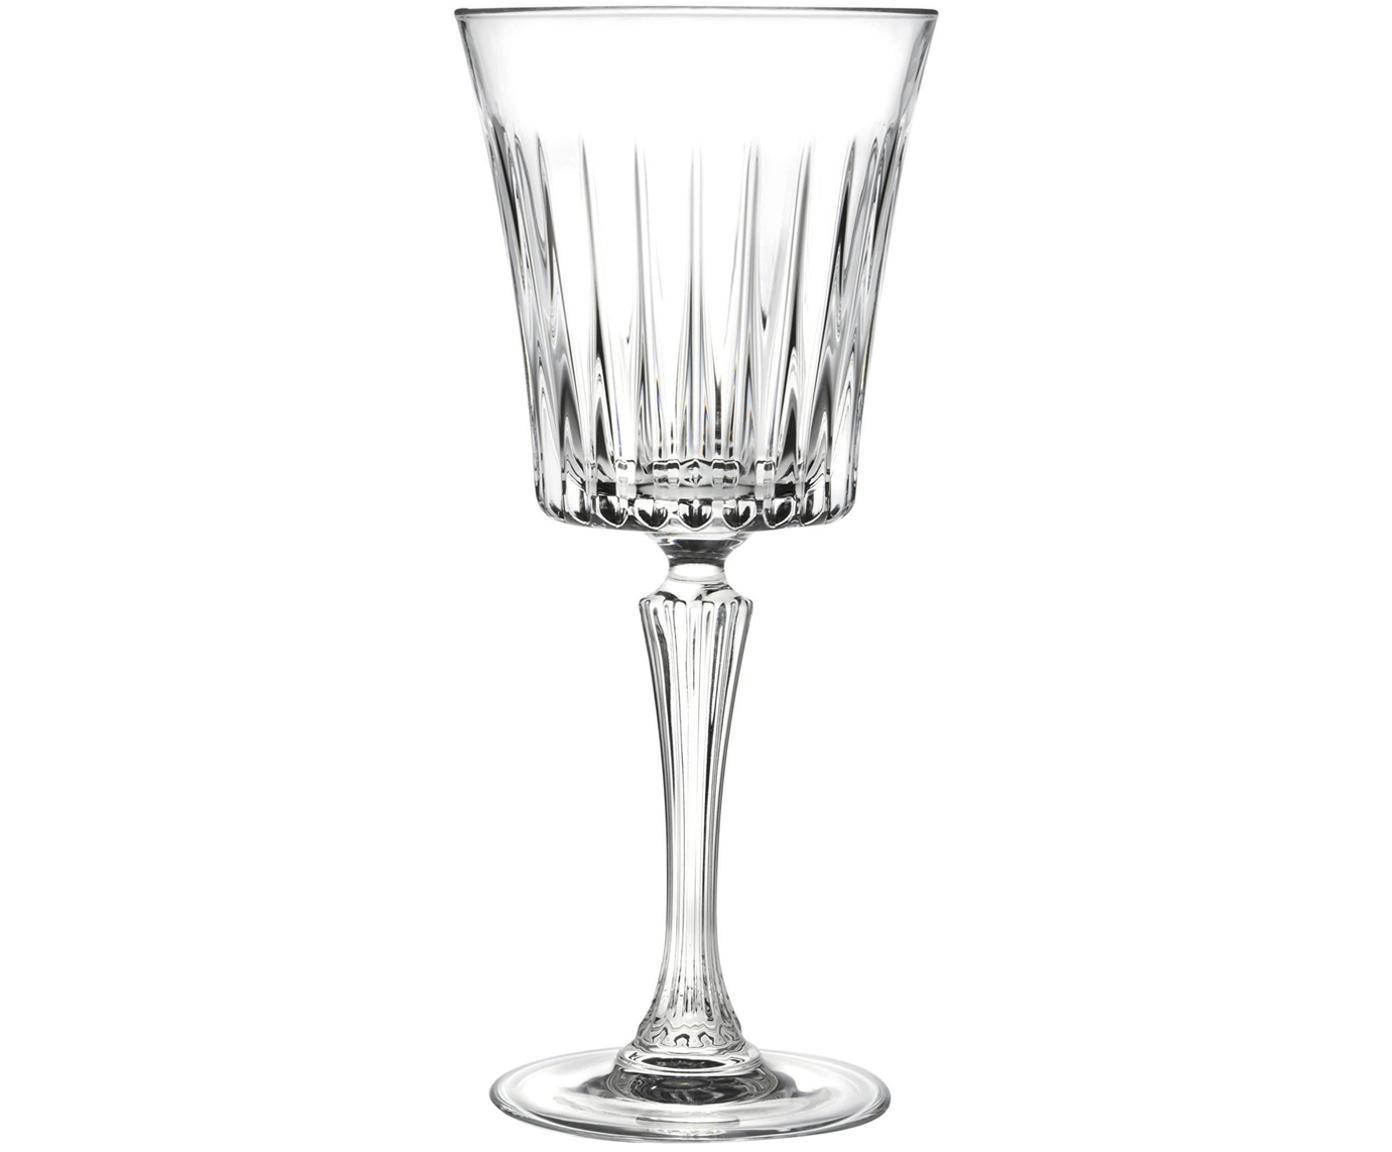 Kristallen rode wijnglazen Timeless, 6 stuks, Kristalglas, Transparant, Ø 9 x H 21 cm